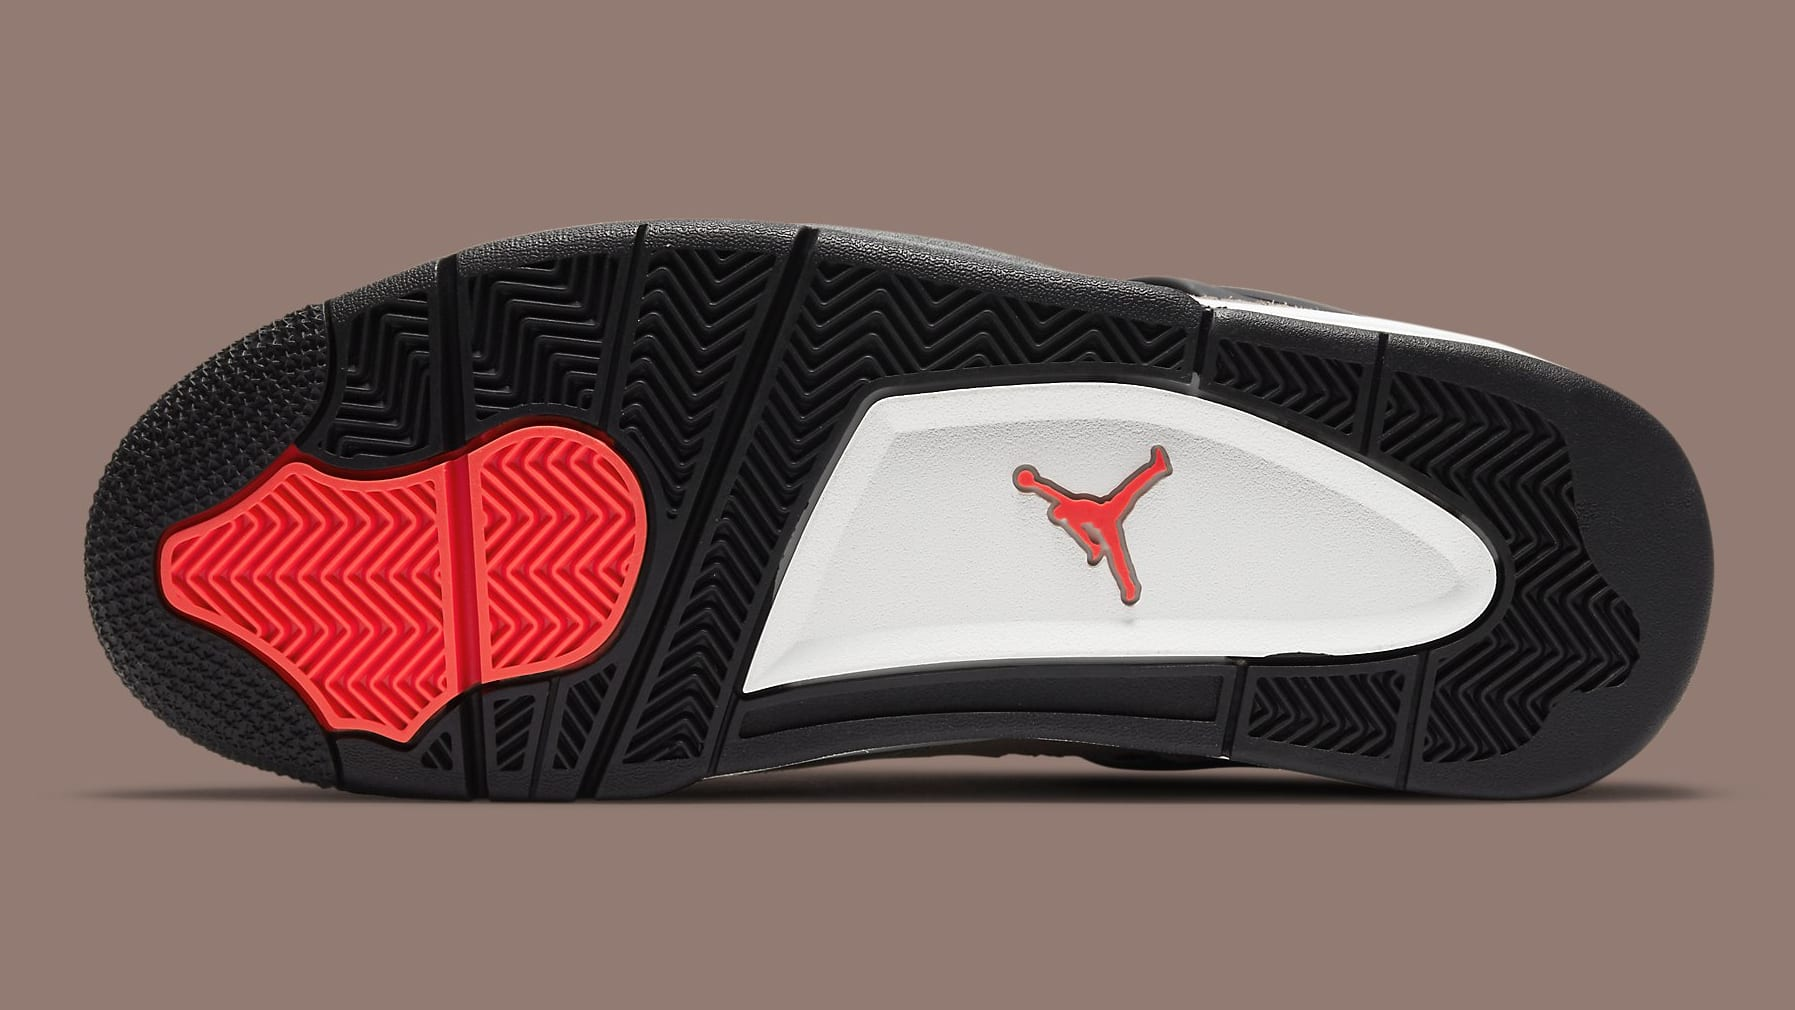 Air Jordan 4 IV Taupe Haze Release Date DB0732-200 Sole